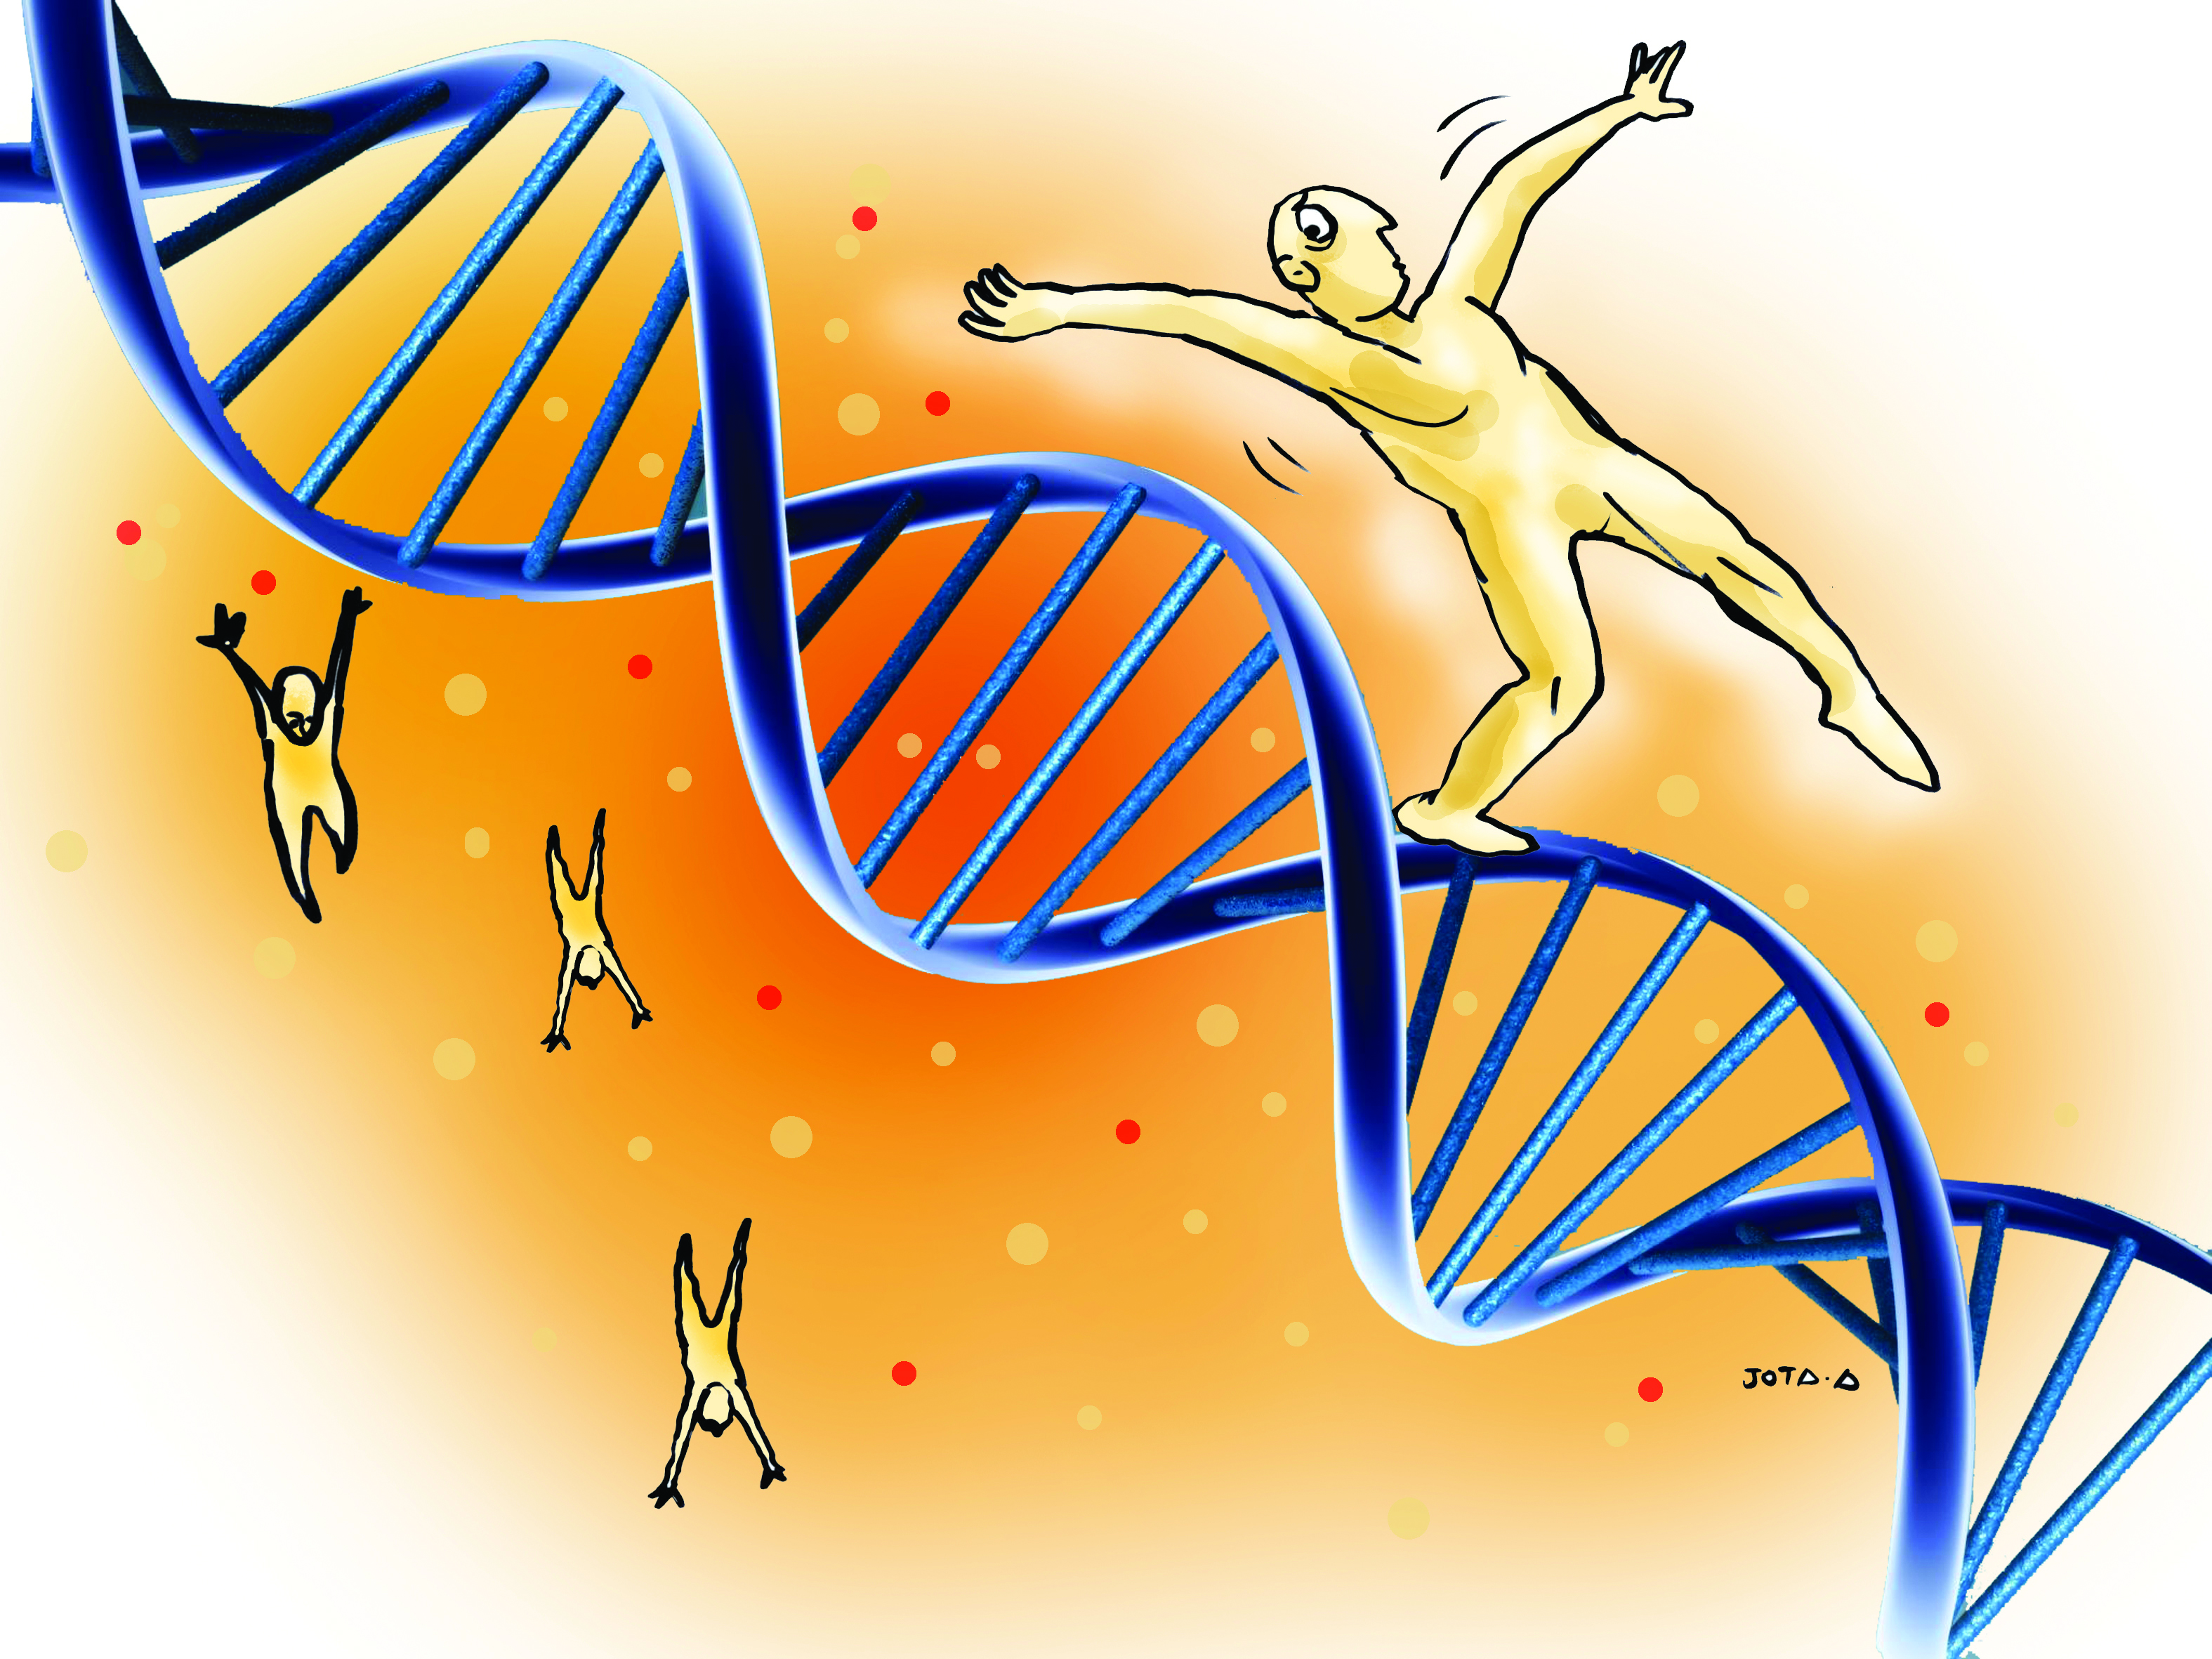 30-genoma Jota A